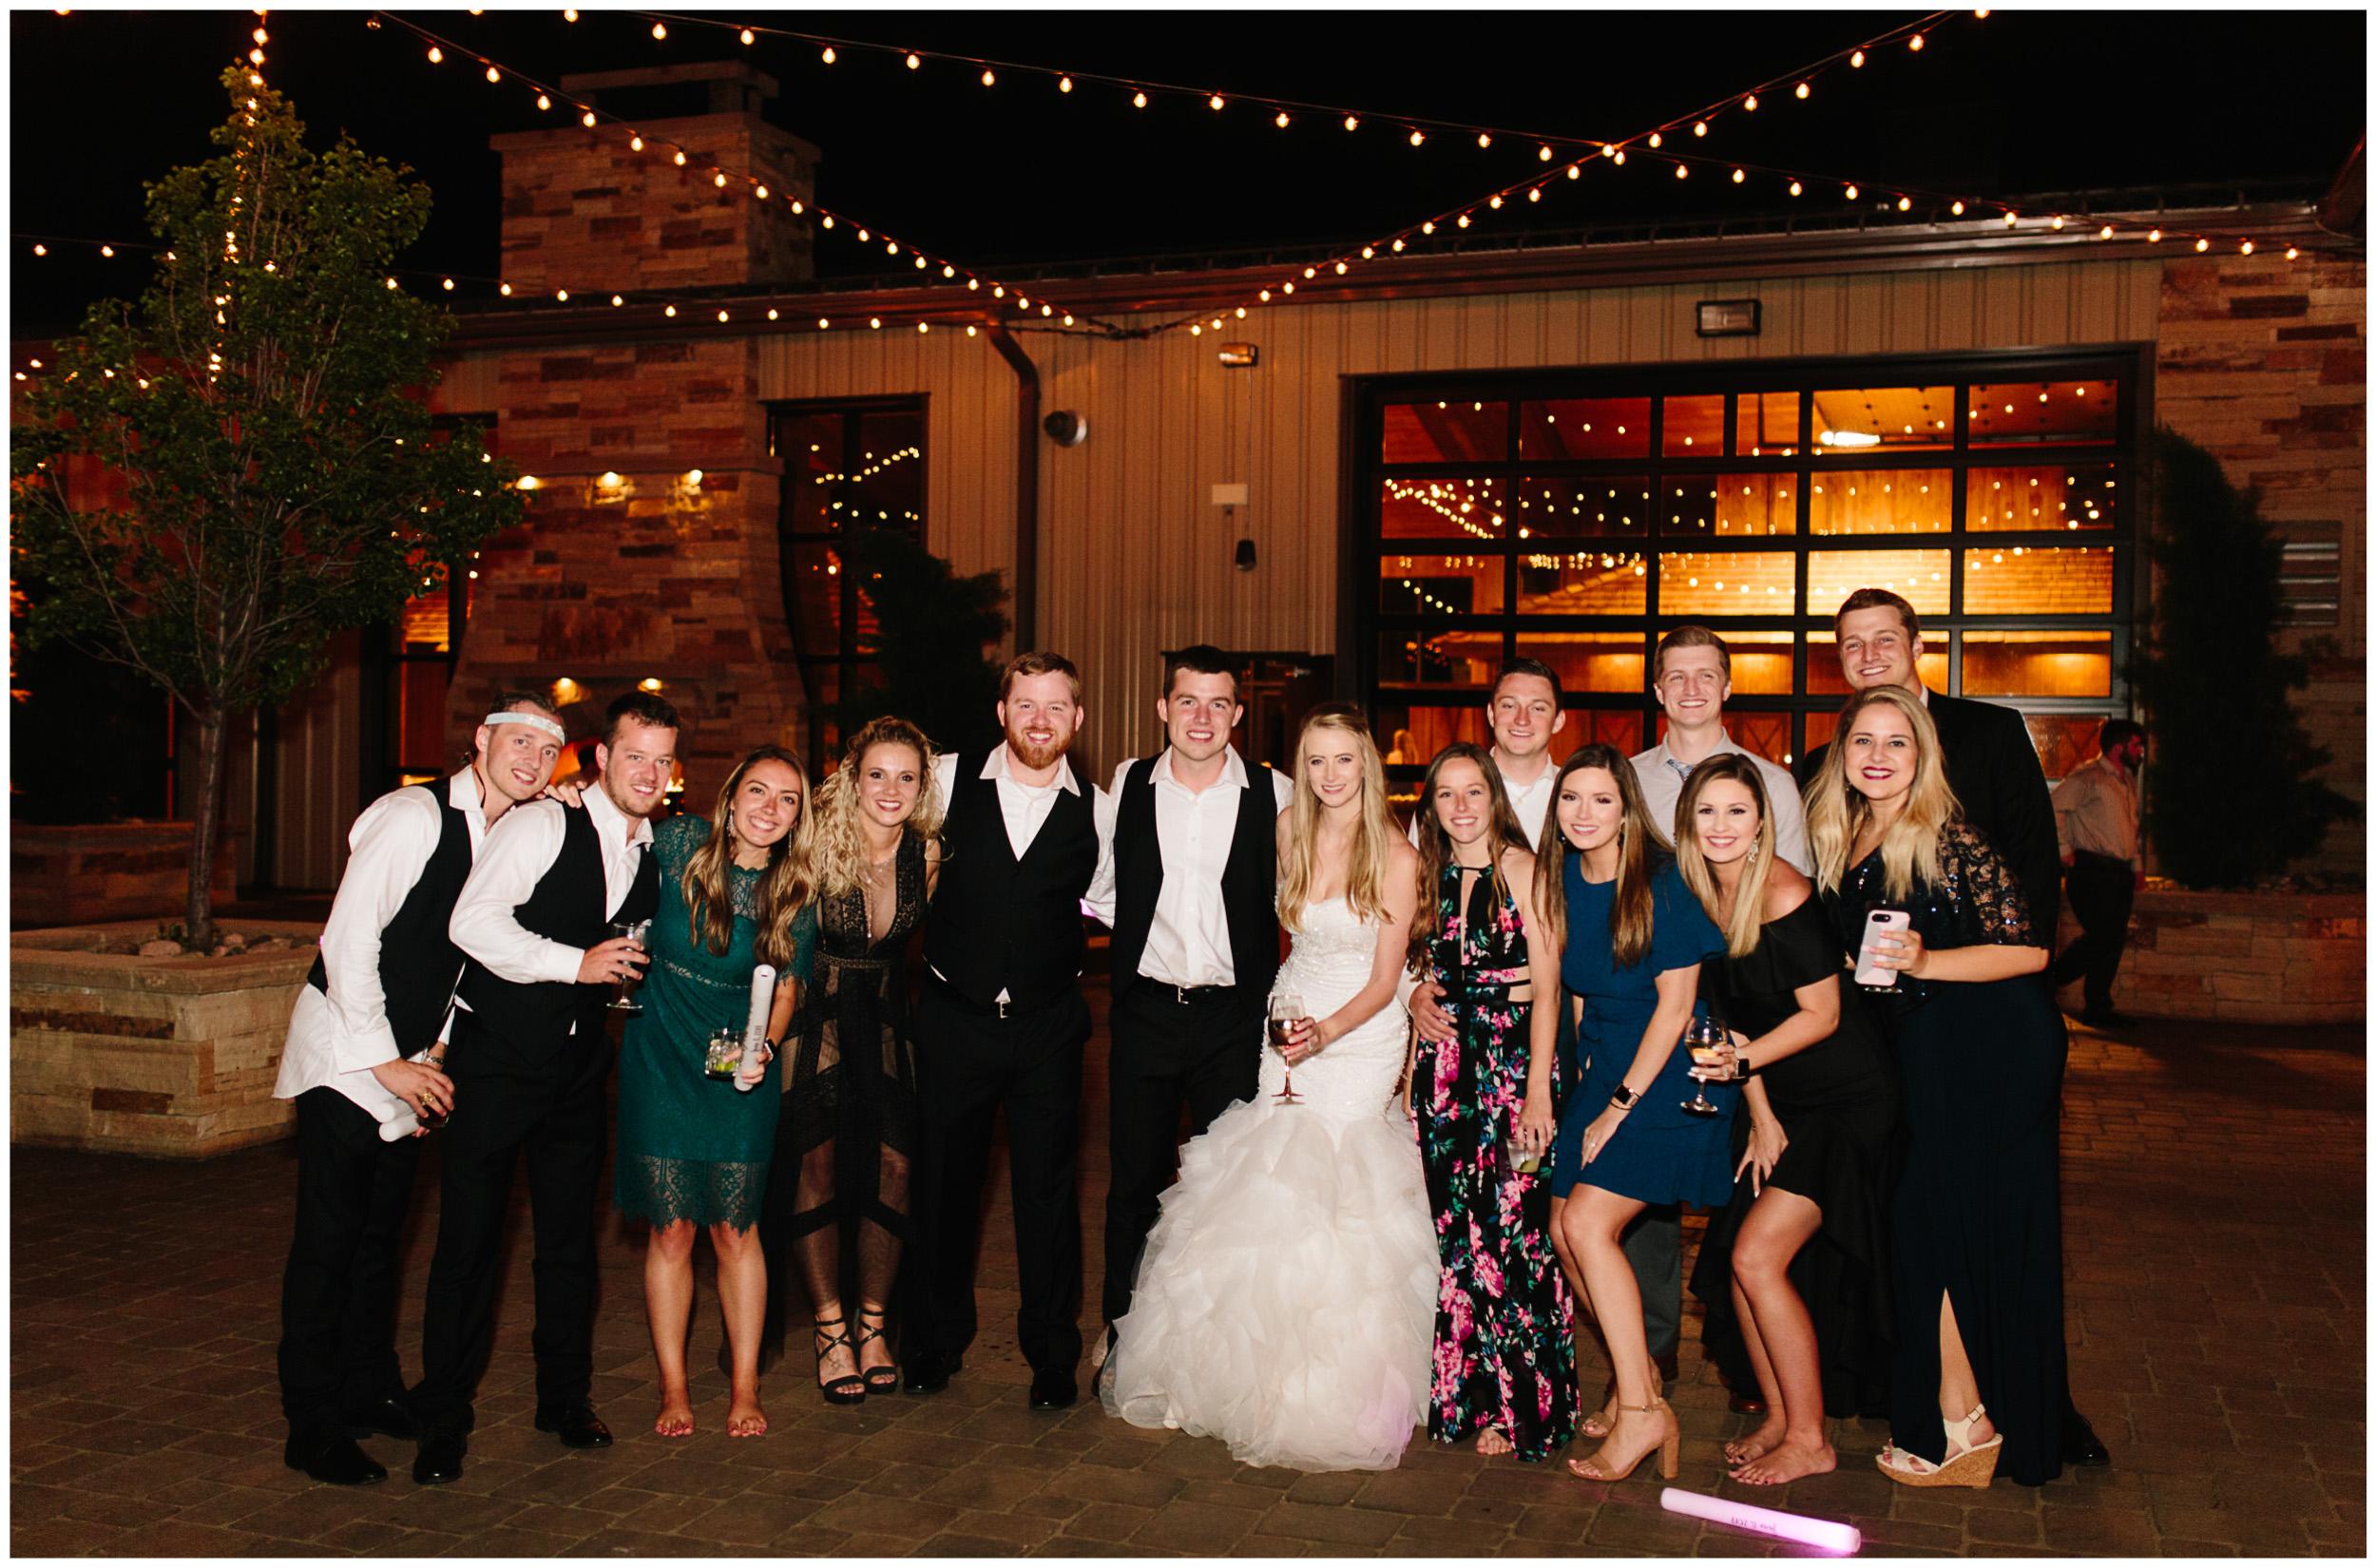 spruce_mountain_ranch_wedding_86.jpg